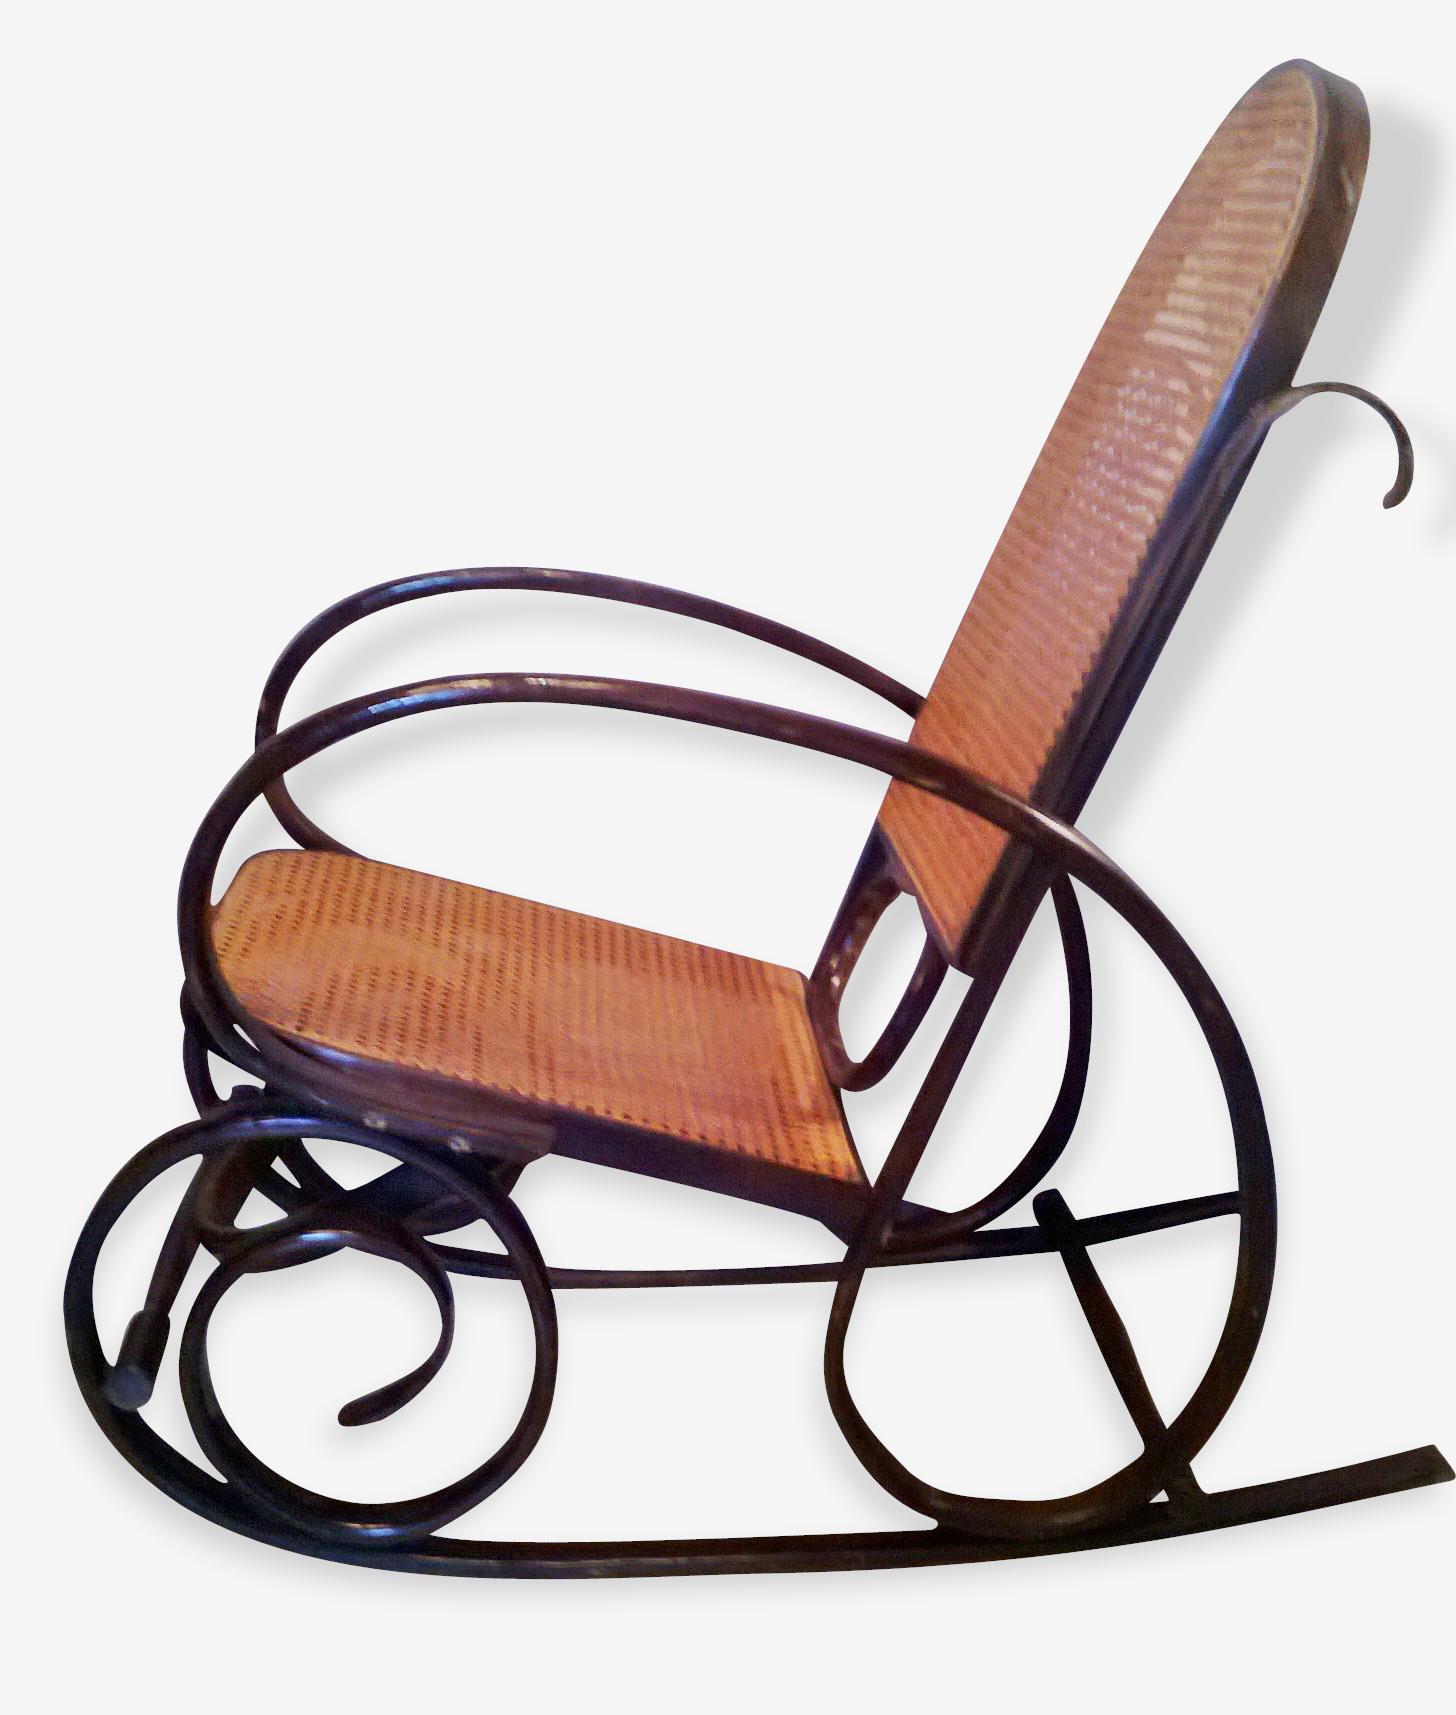 Rocking chair vintage, Marque Thonet